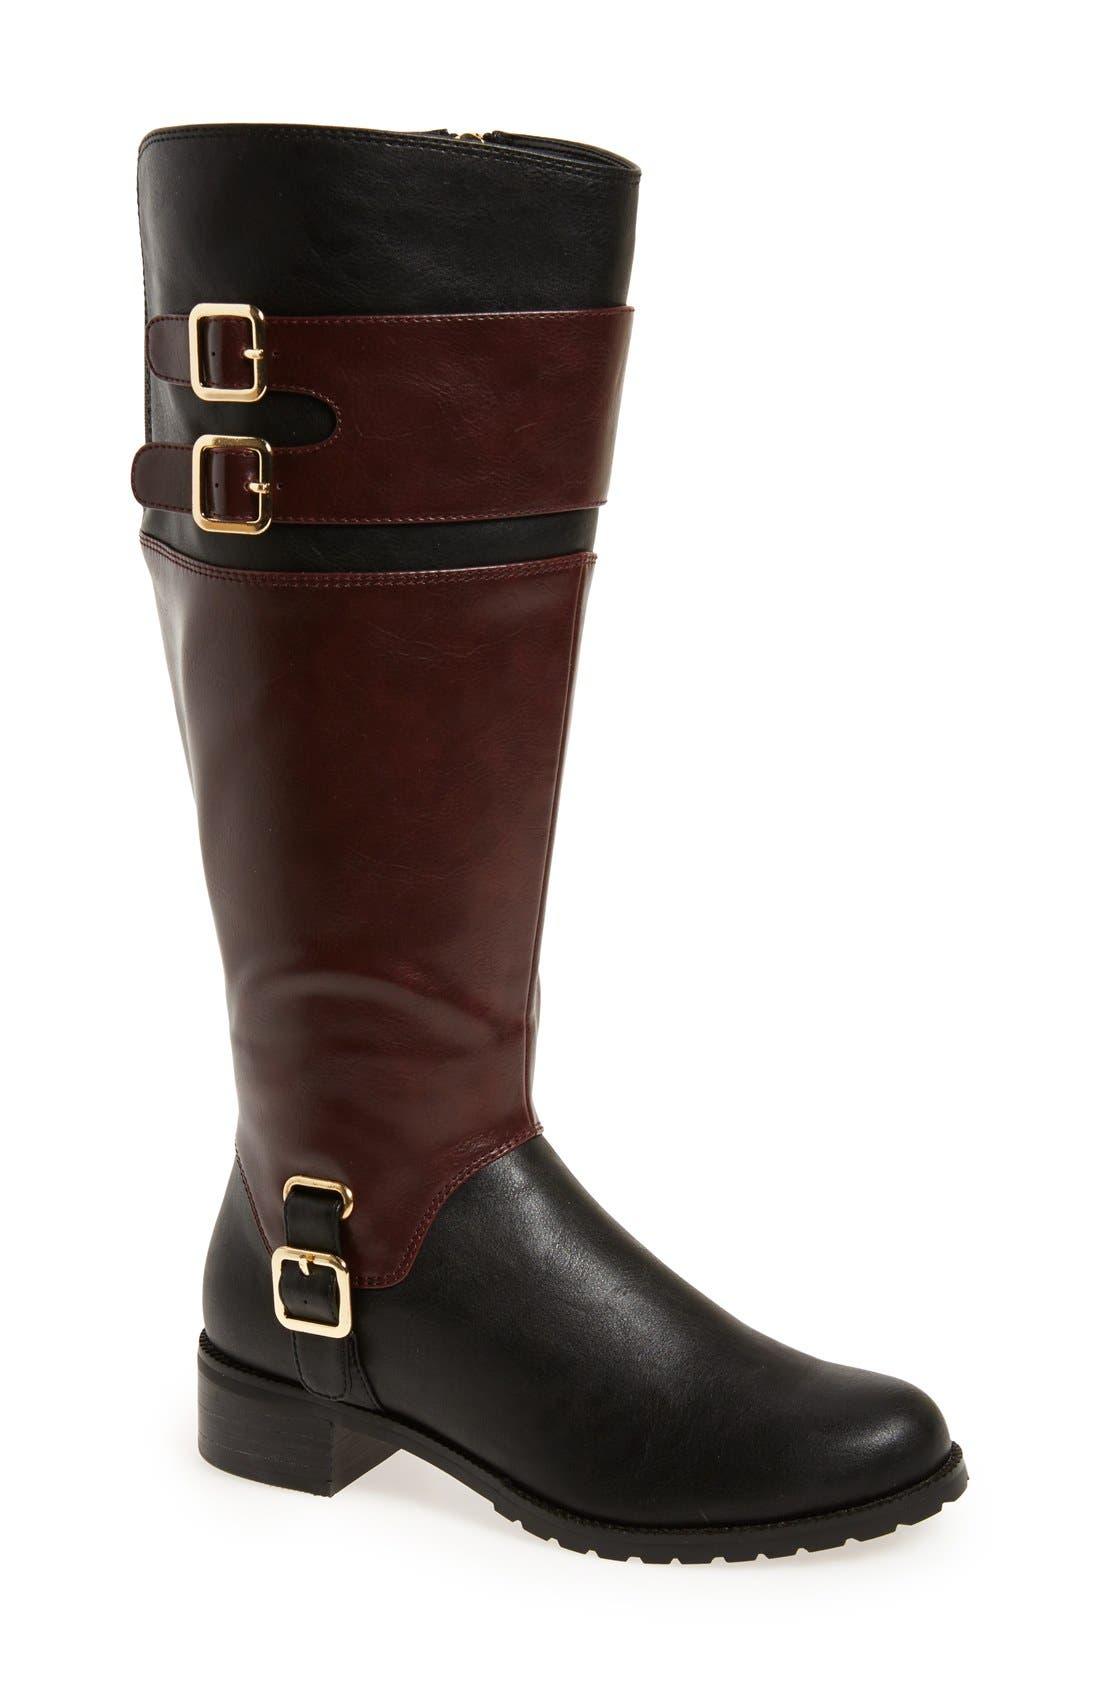 Main Image - Bella Vita 'Adriann II' Knee High Boot (Women) (Wide Calf)